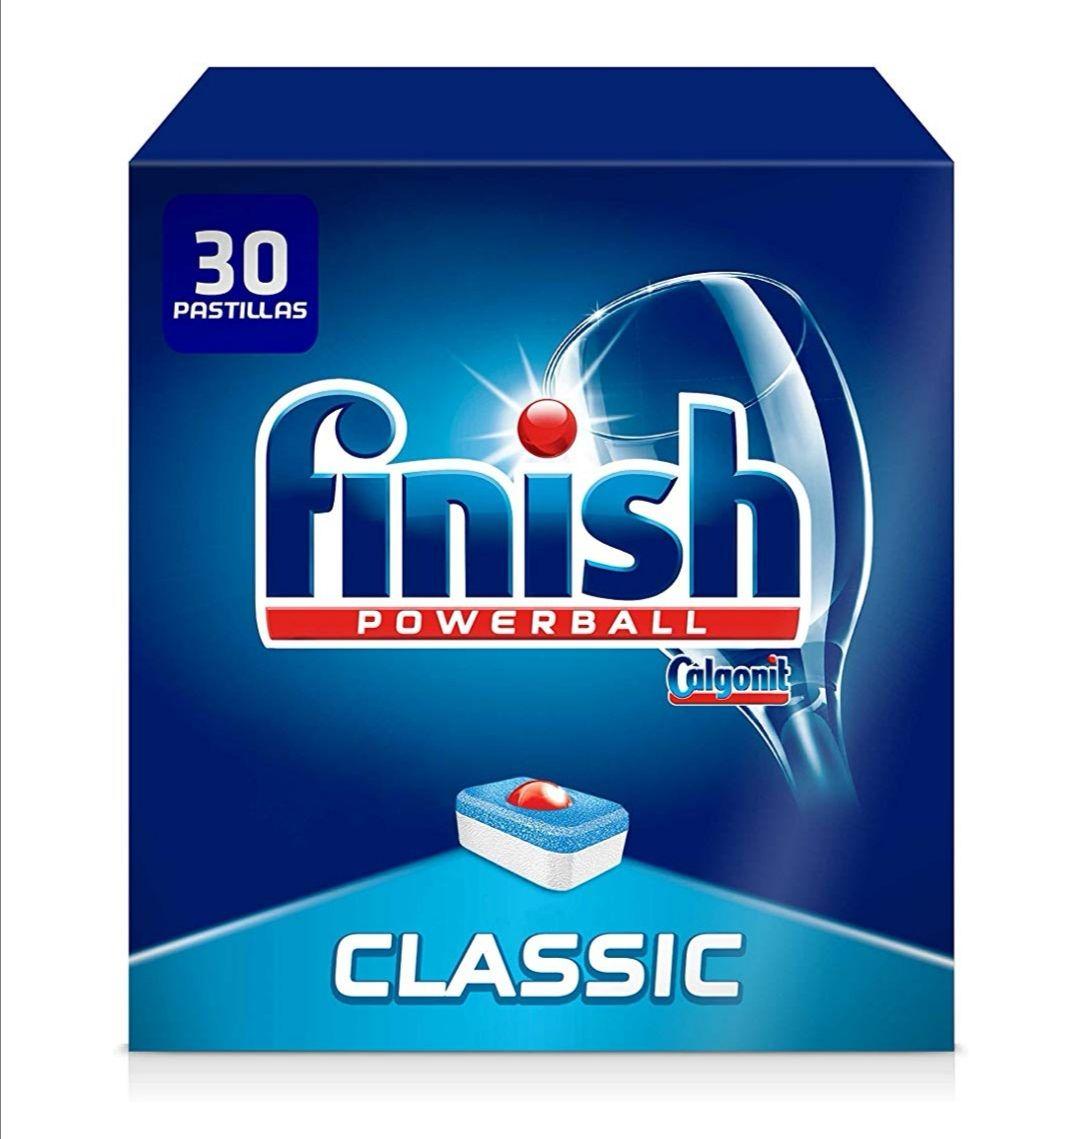 Finish Classic Regular - 30 Pastillas - Pack de 2